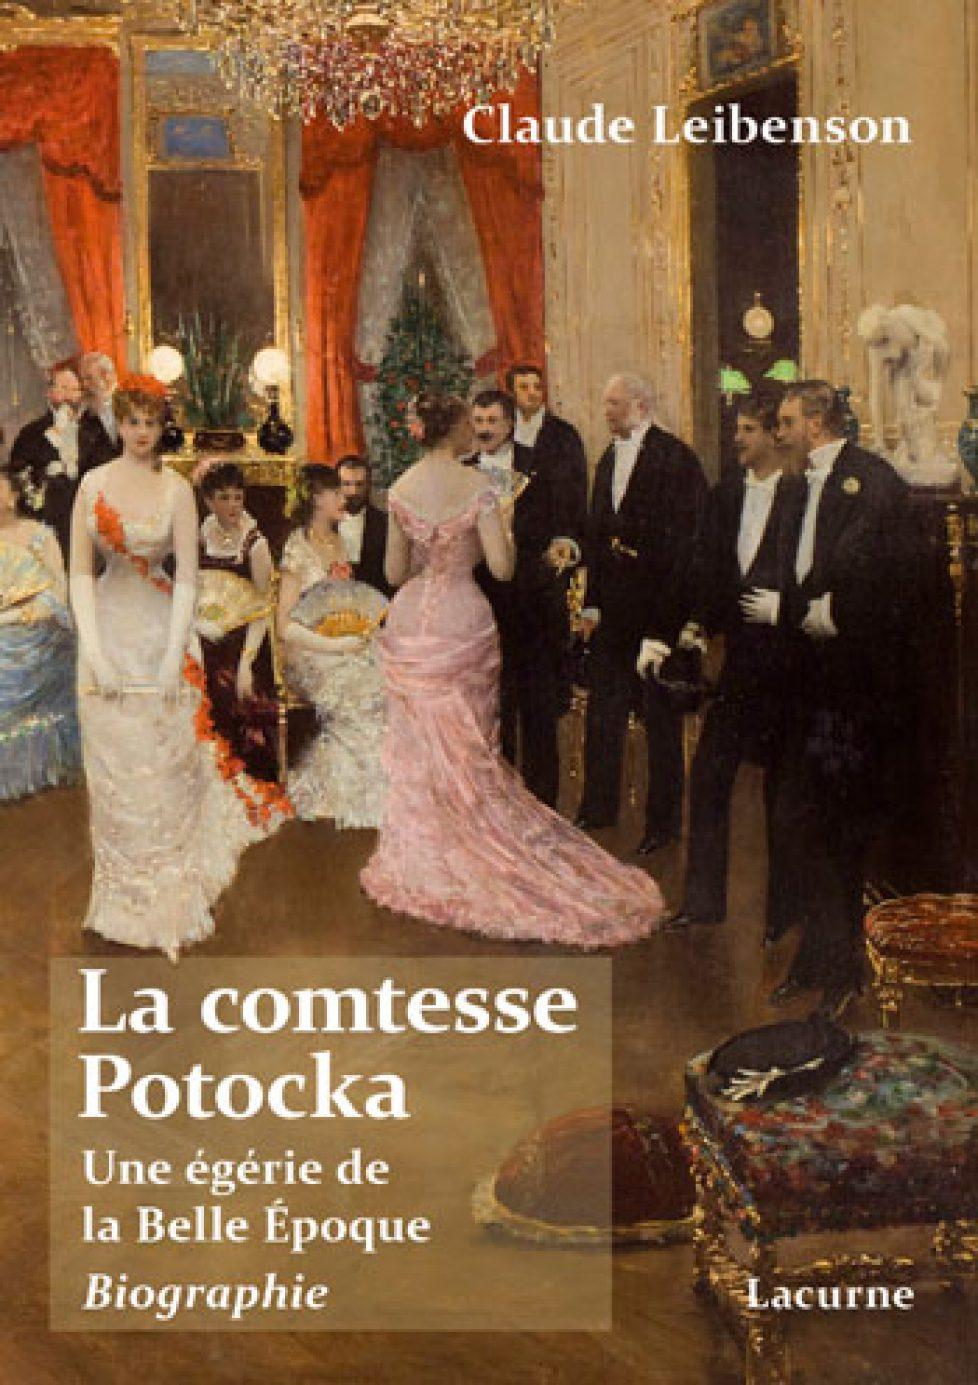 Biographie de la comtesse Potocka